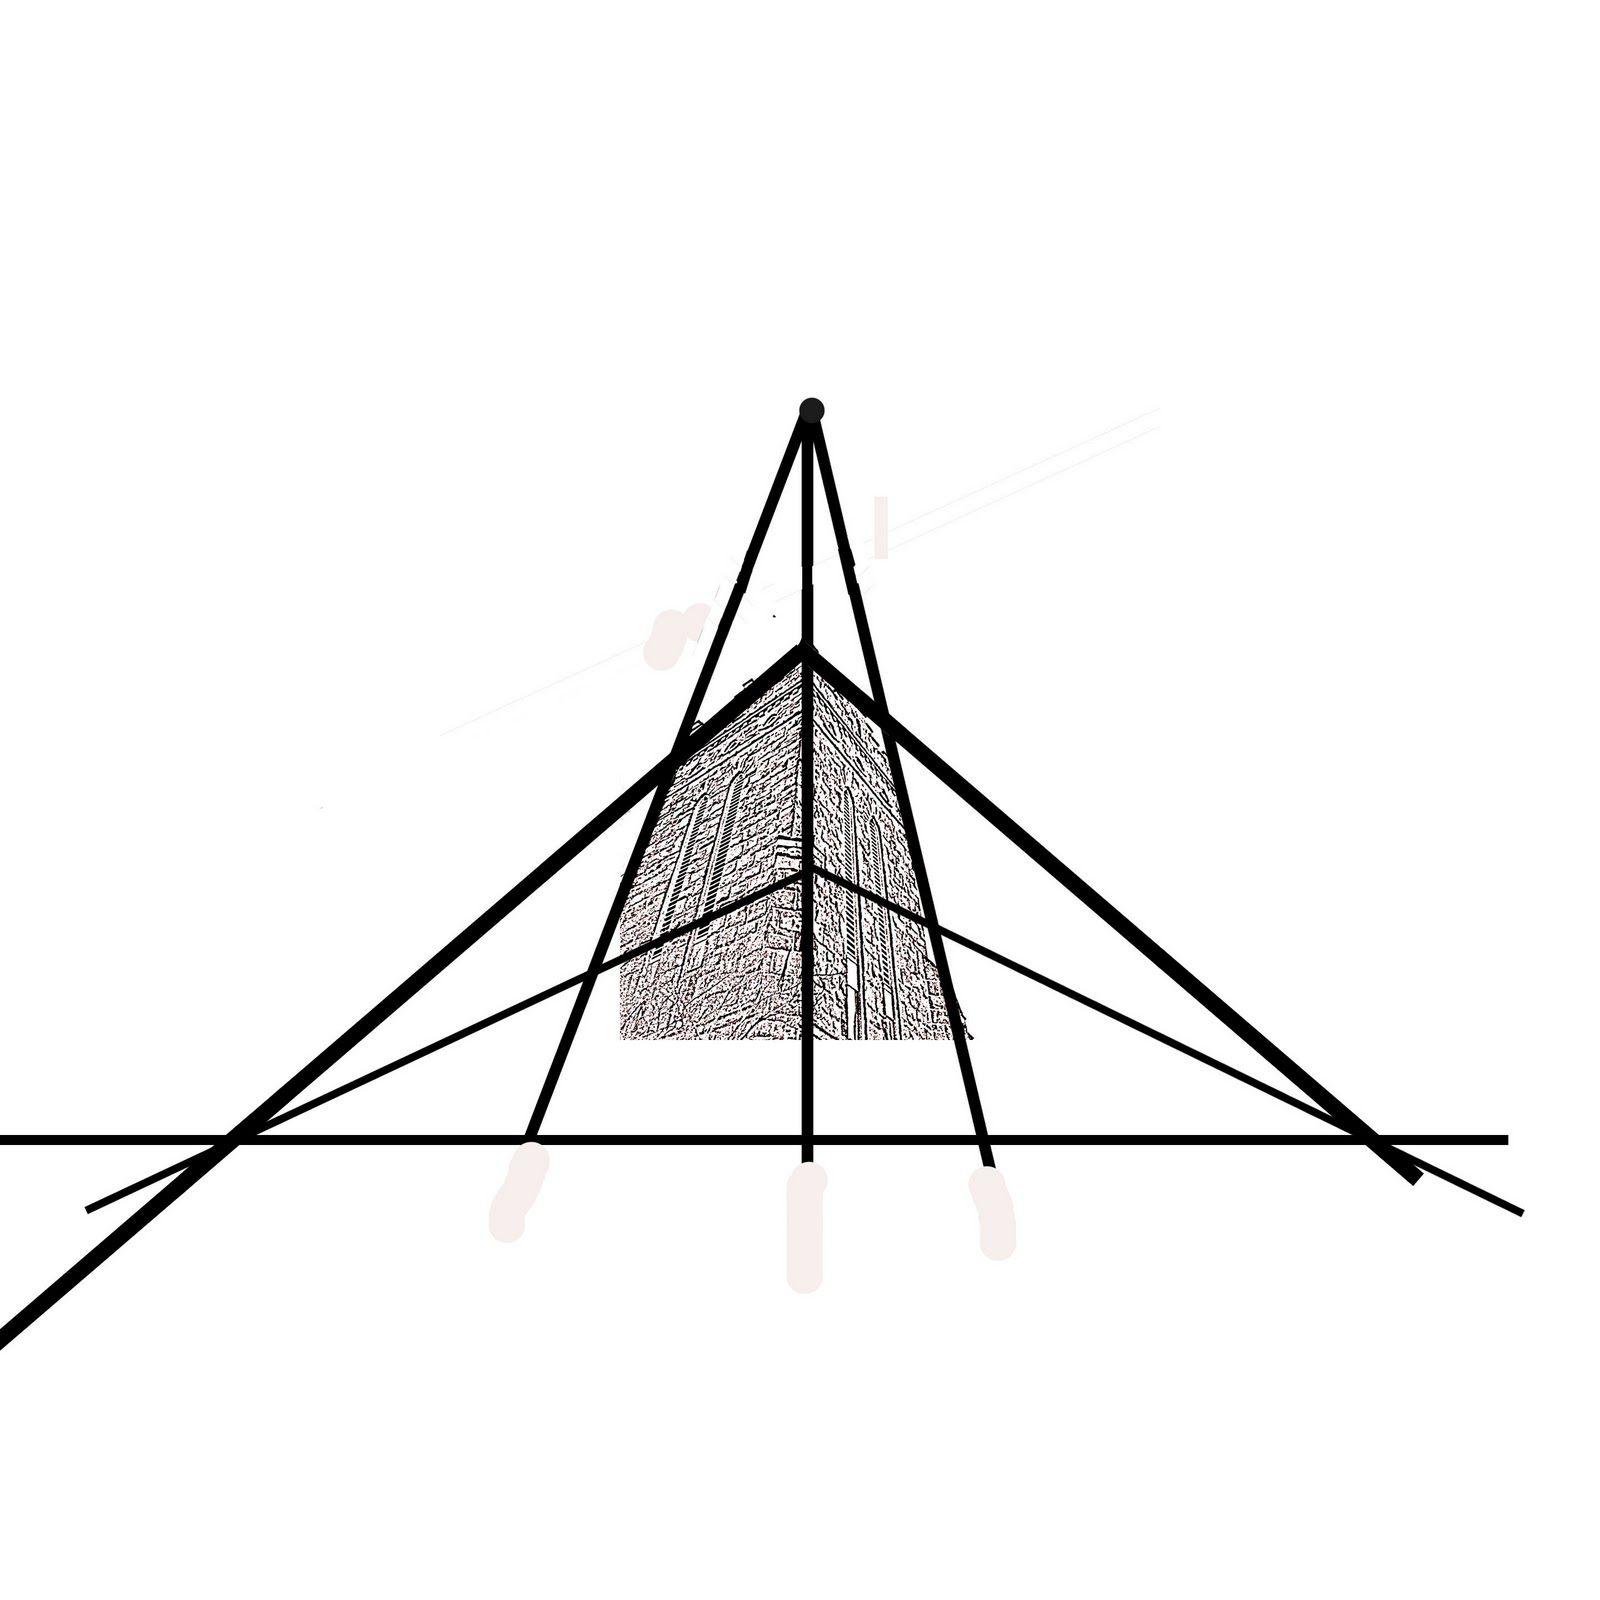 Three Point Perspective Worm S Eye Vs Bird S Eye View